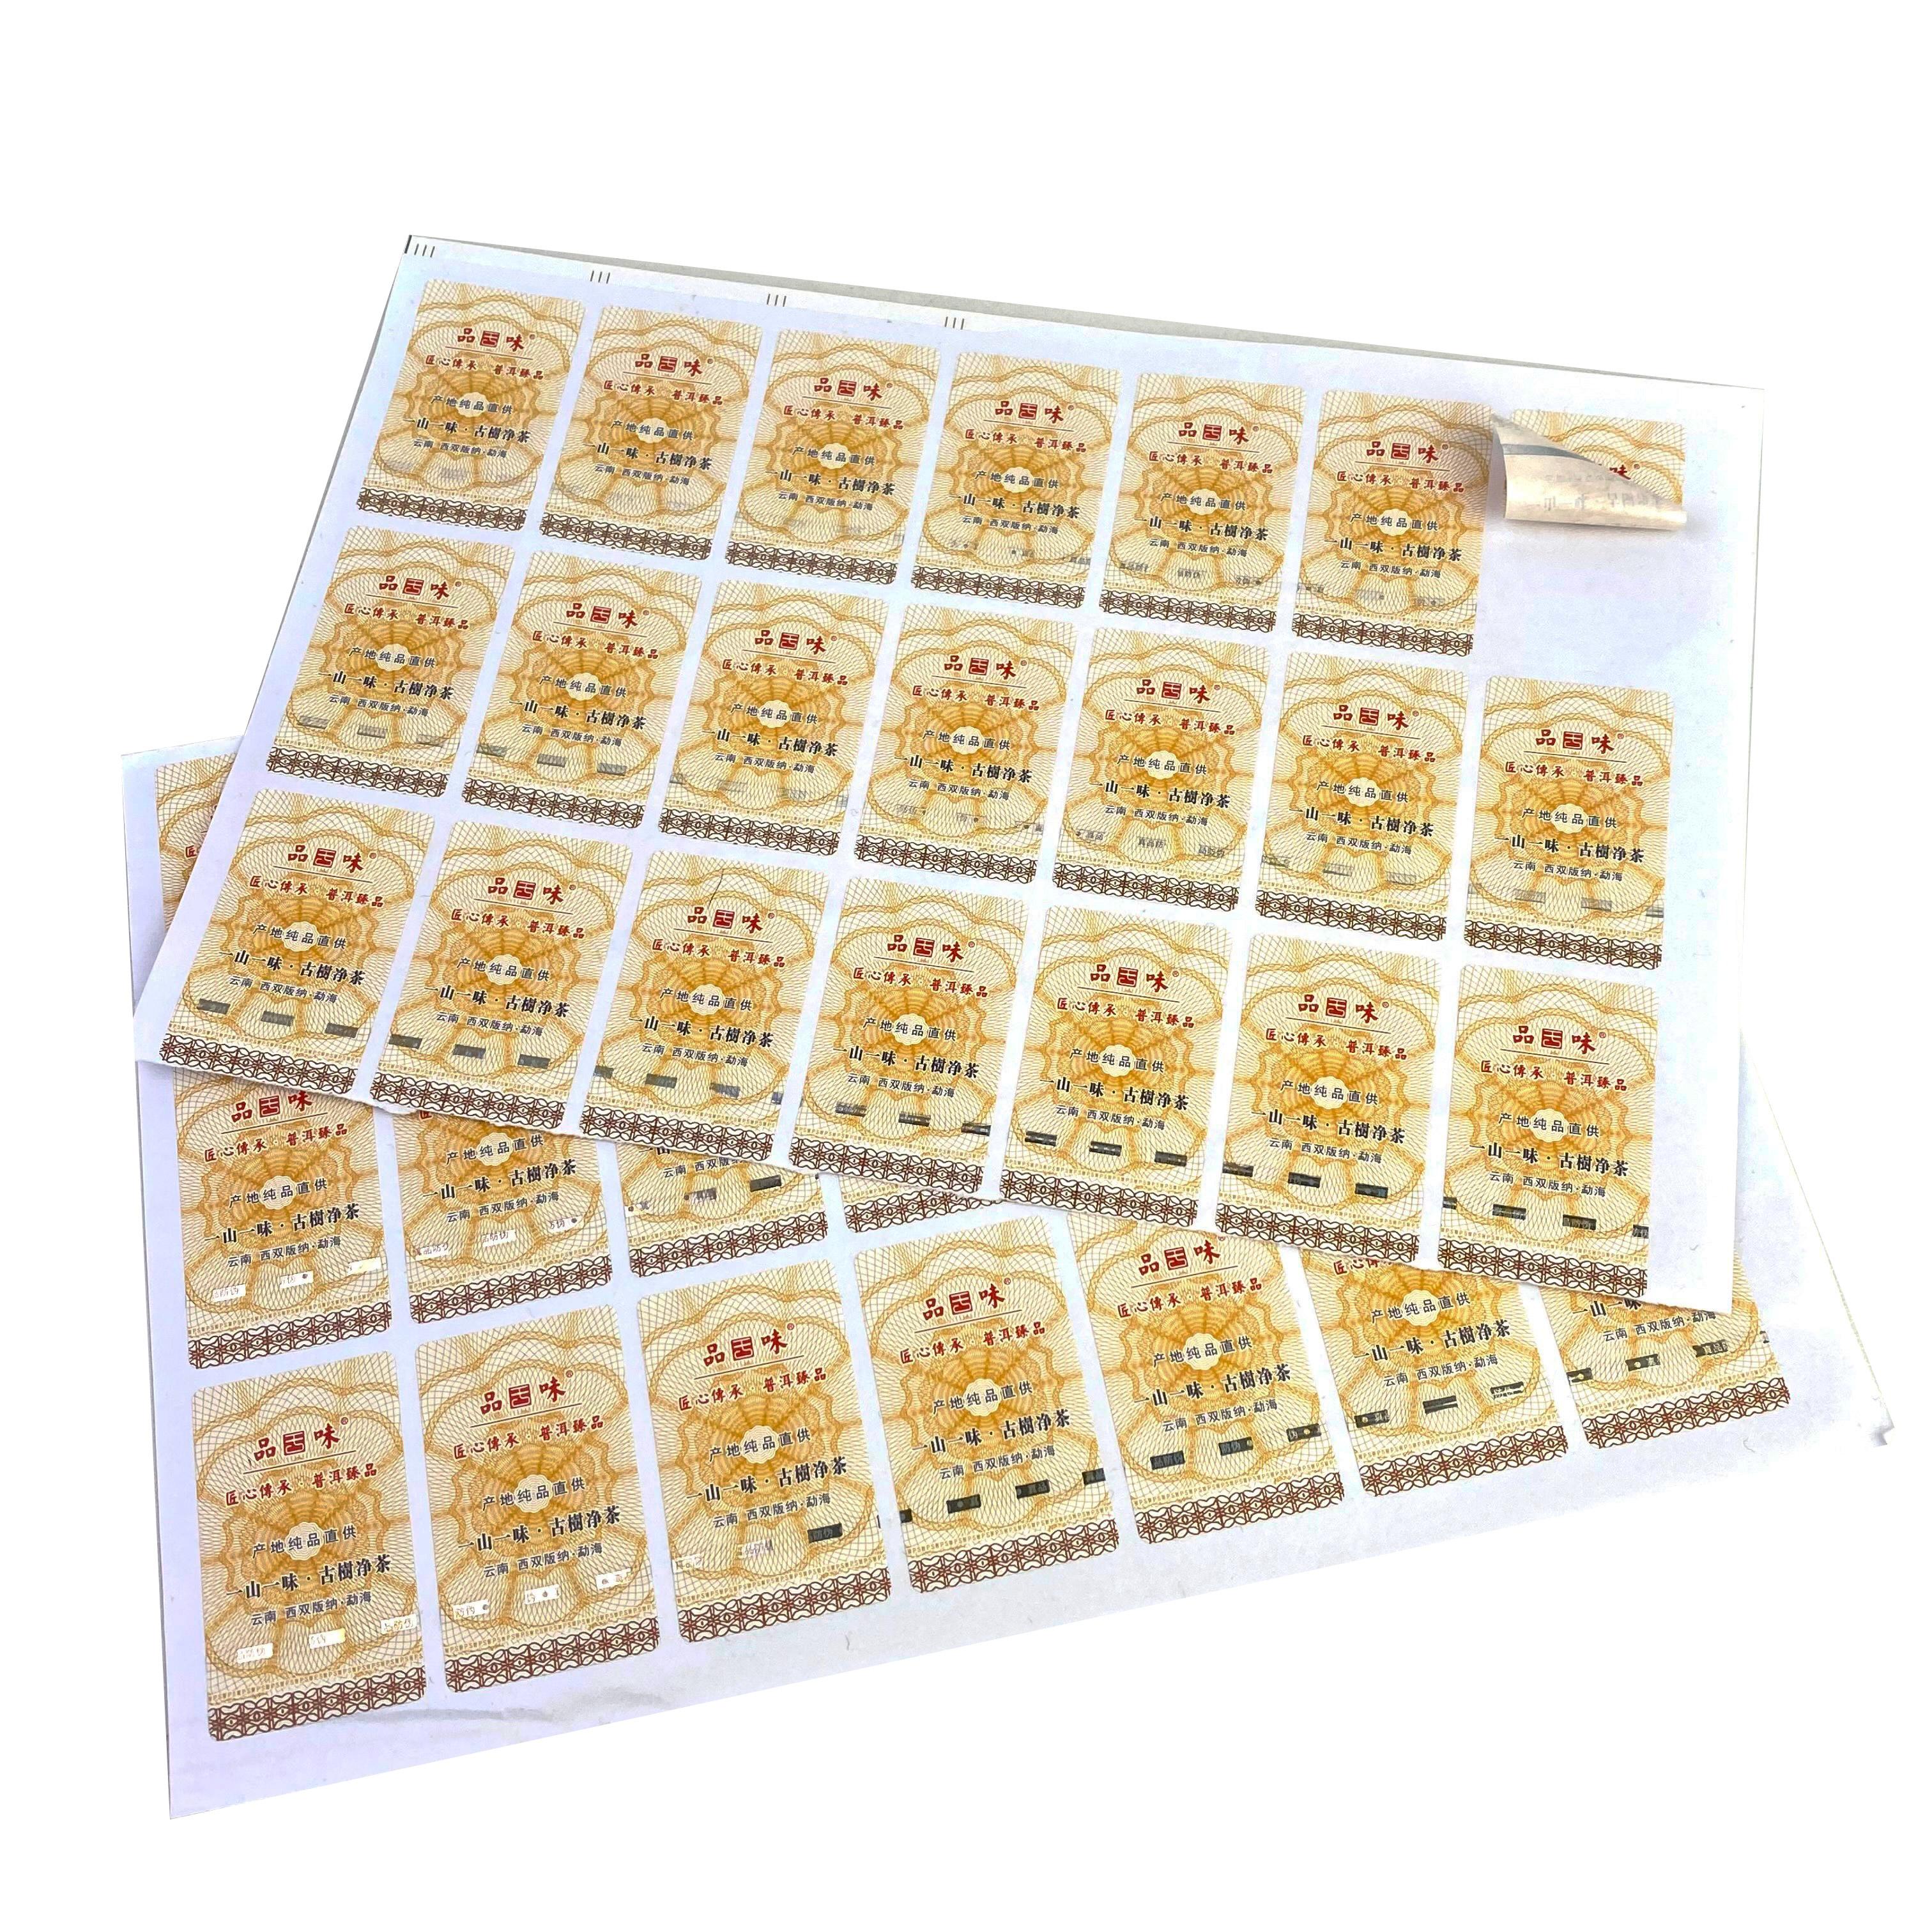 Anti-fake Bar Genuine Authertic Original Security Custom Sticker Anti Counterfeiting Product Private Label